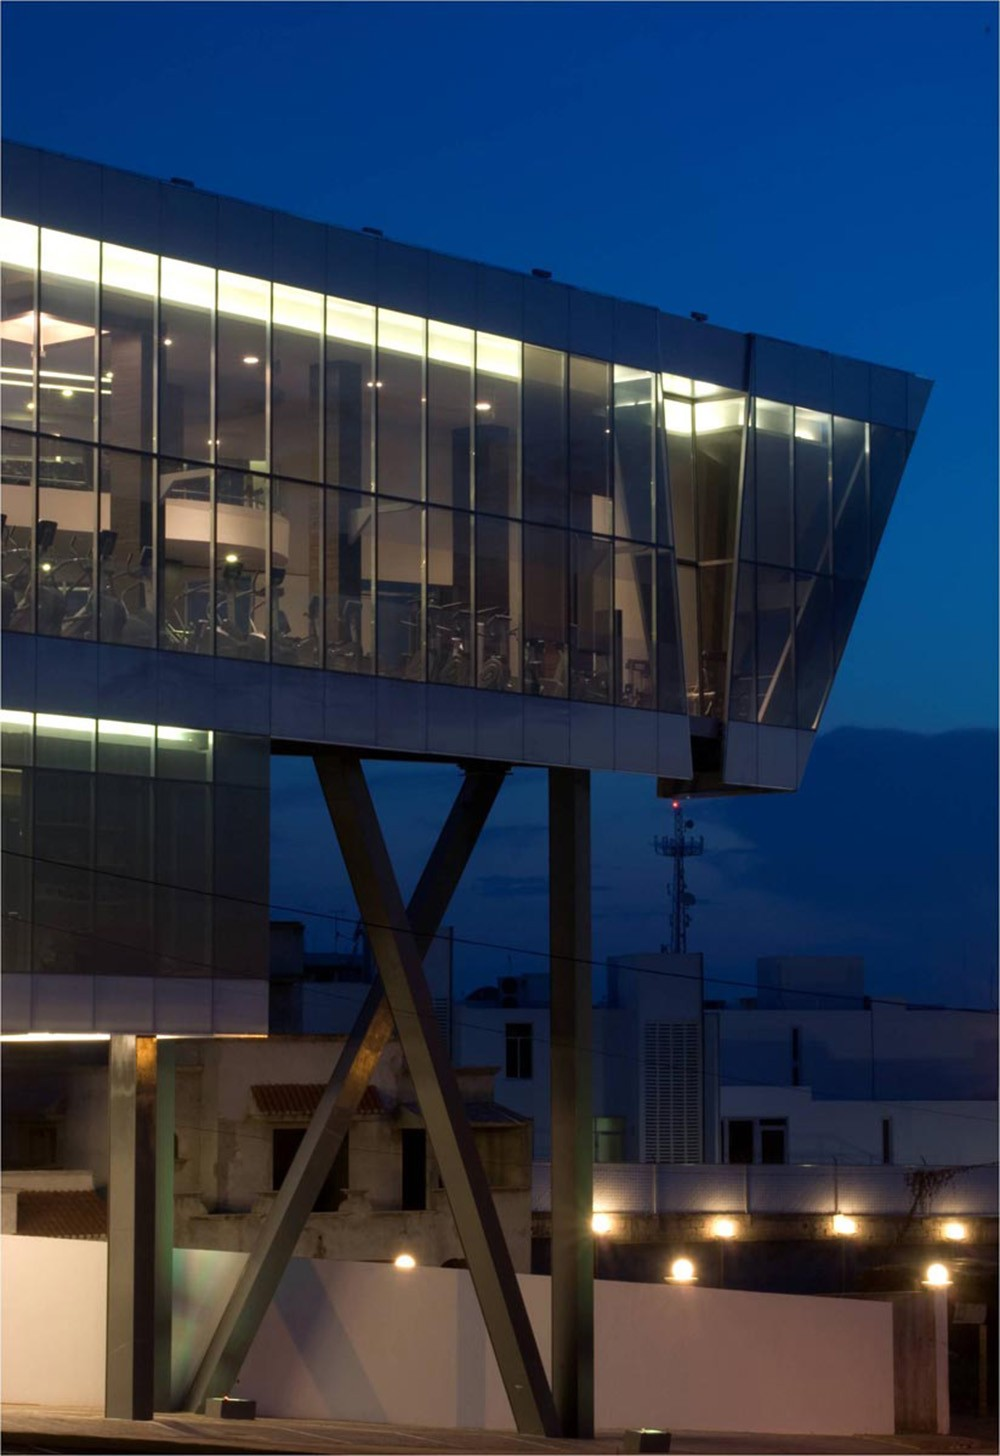 Centru de fitness - Centru de fitness intr-o forma arhitecturala contemporana